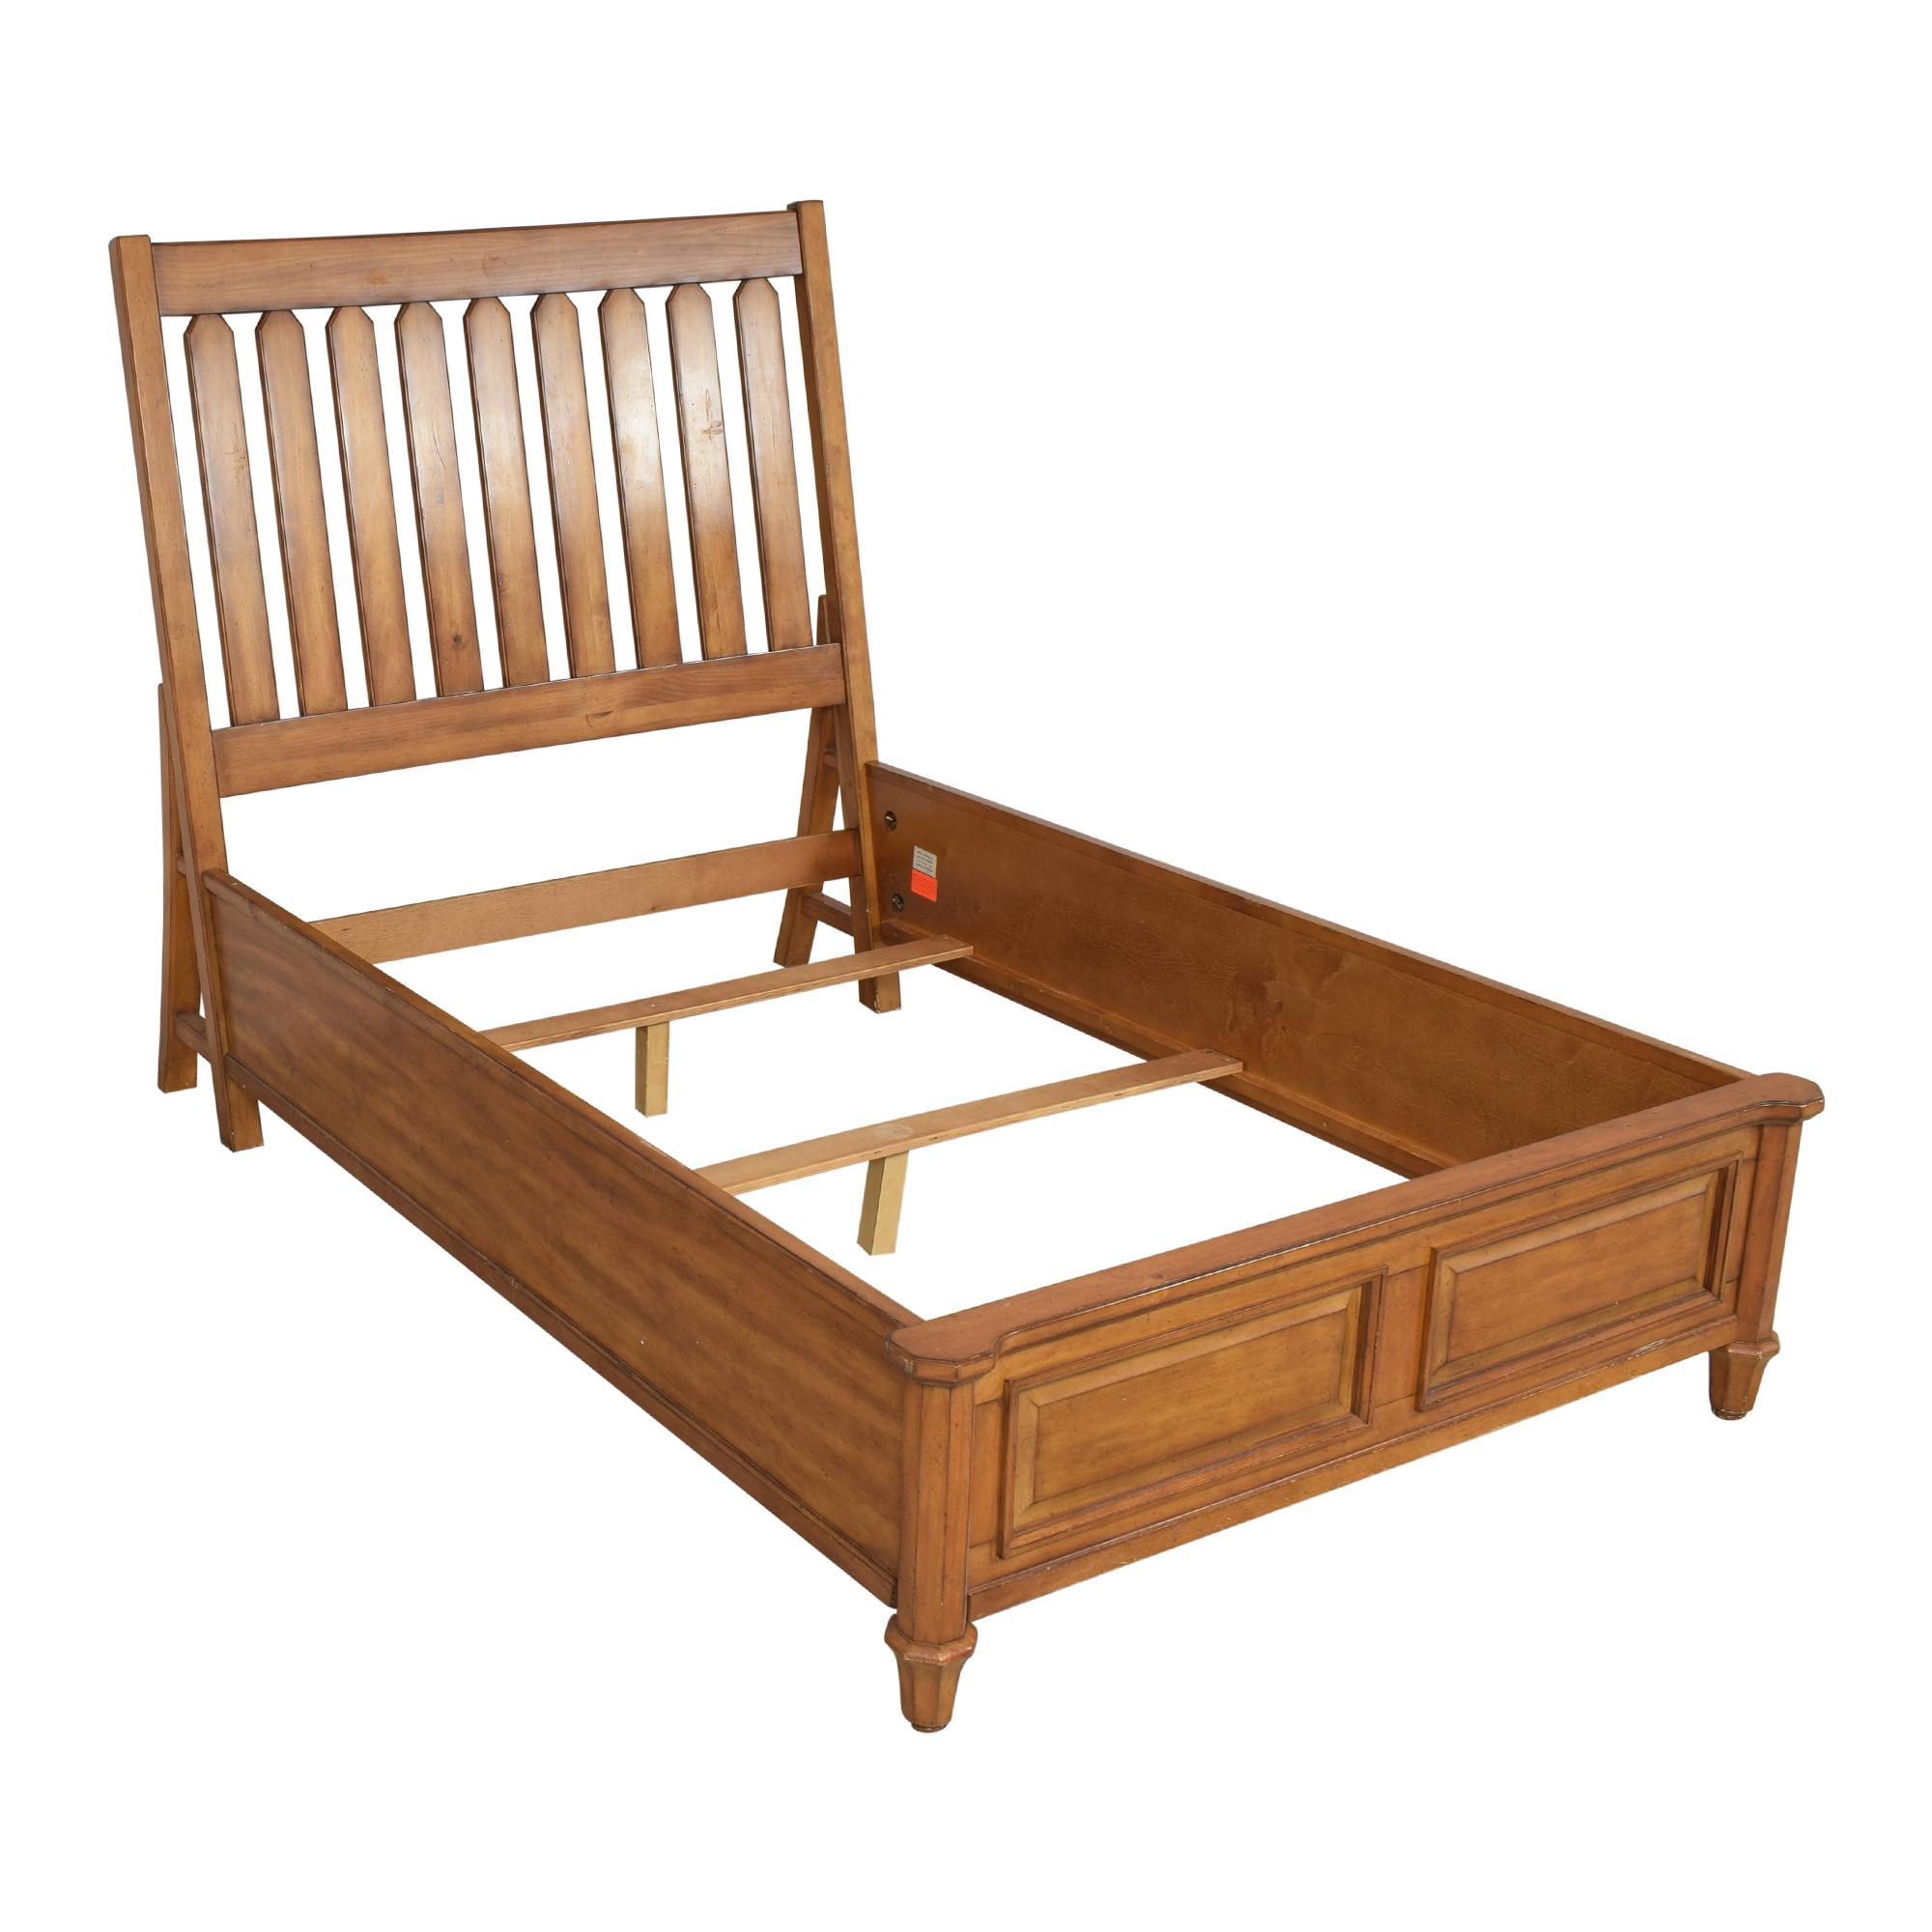 Full Size Platform Bed price